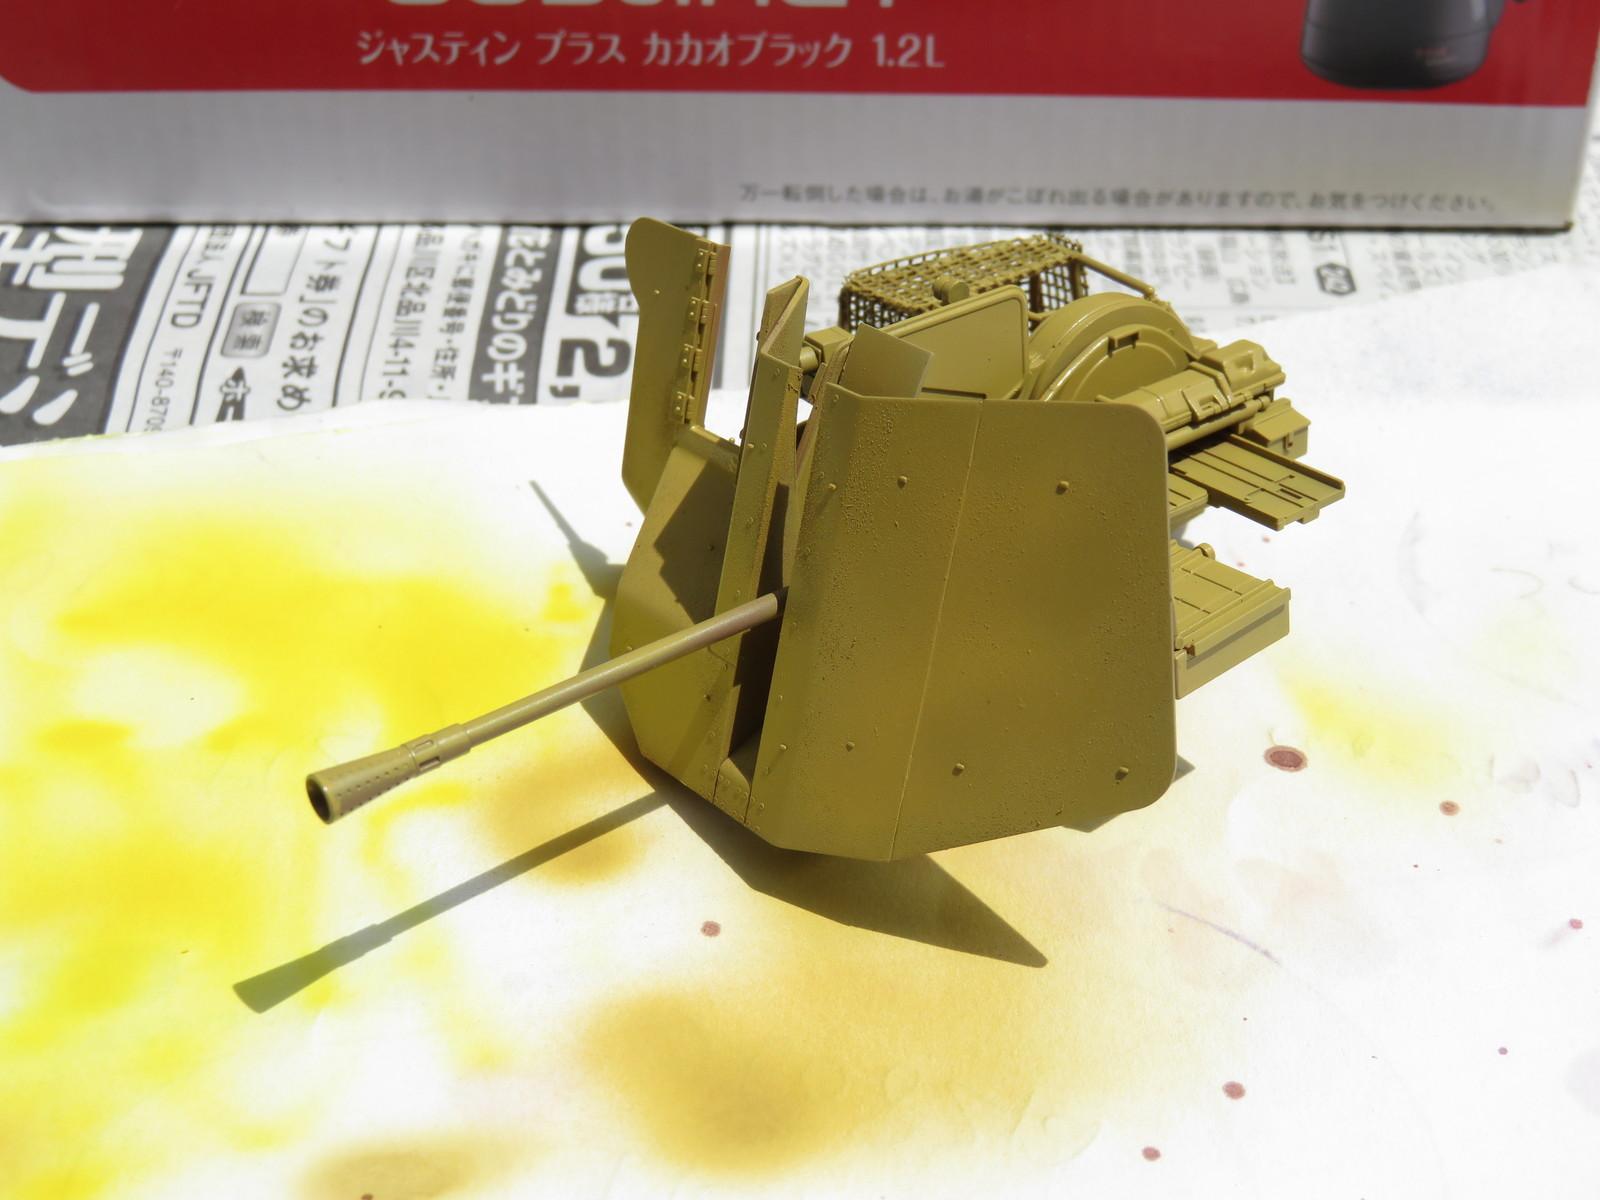 Flak43 ダークイエロー塗装